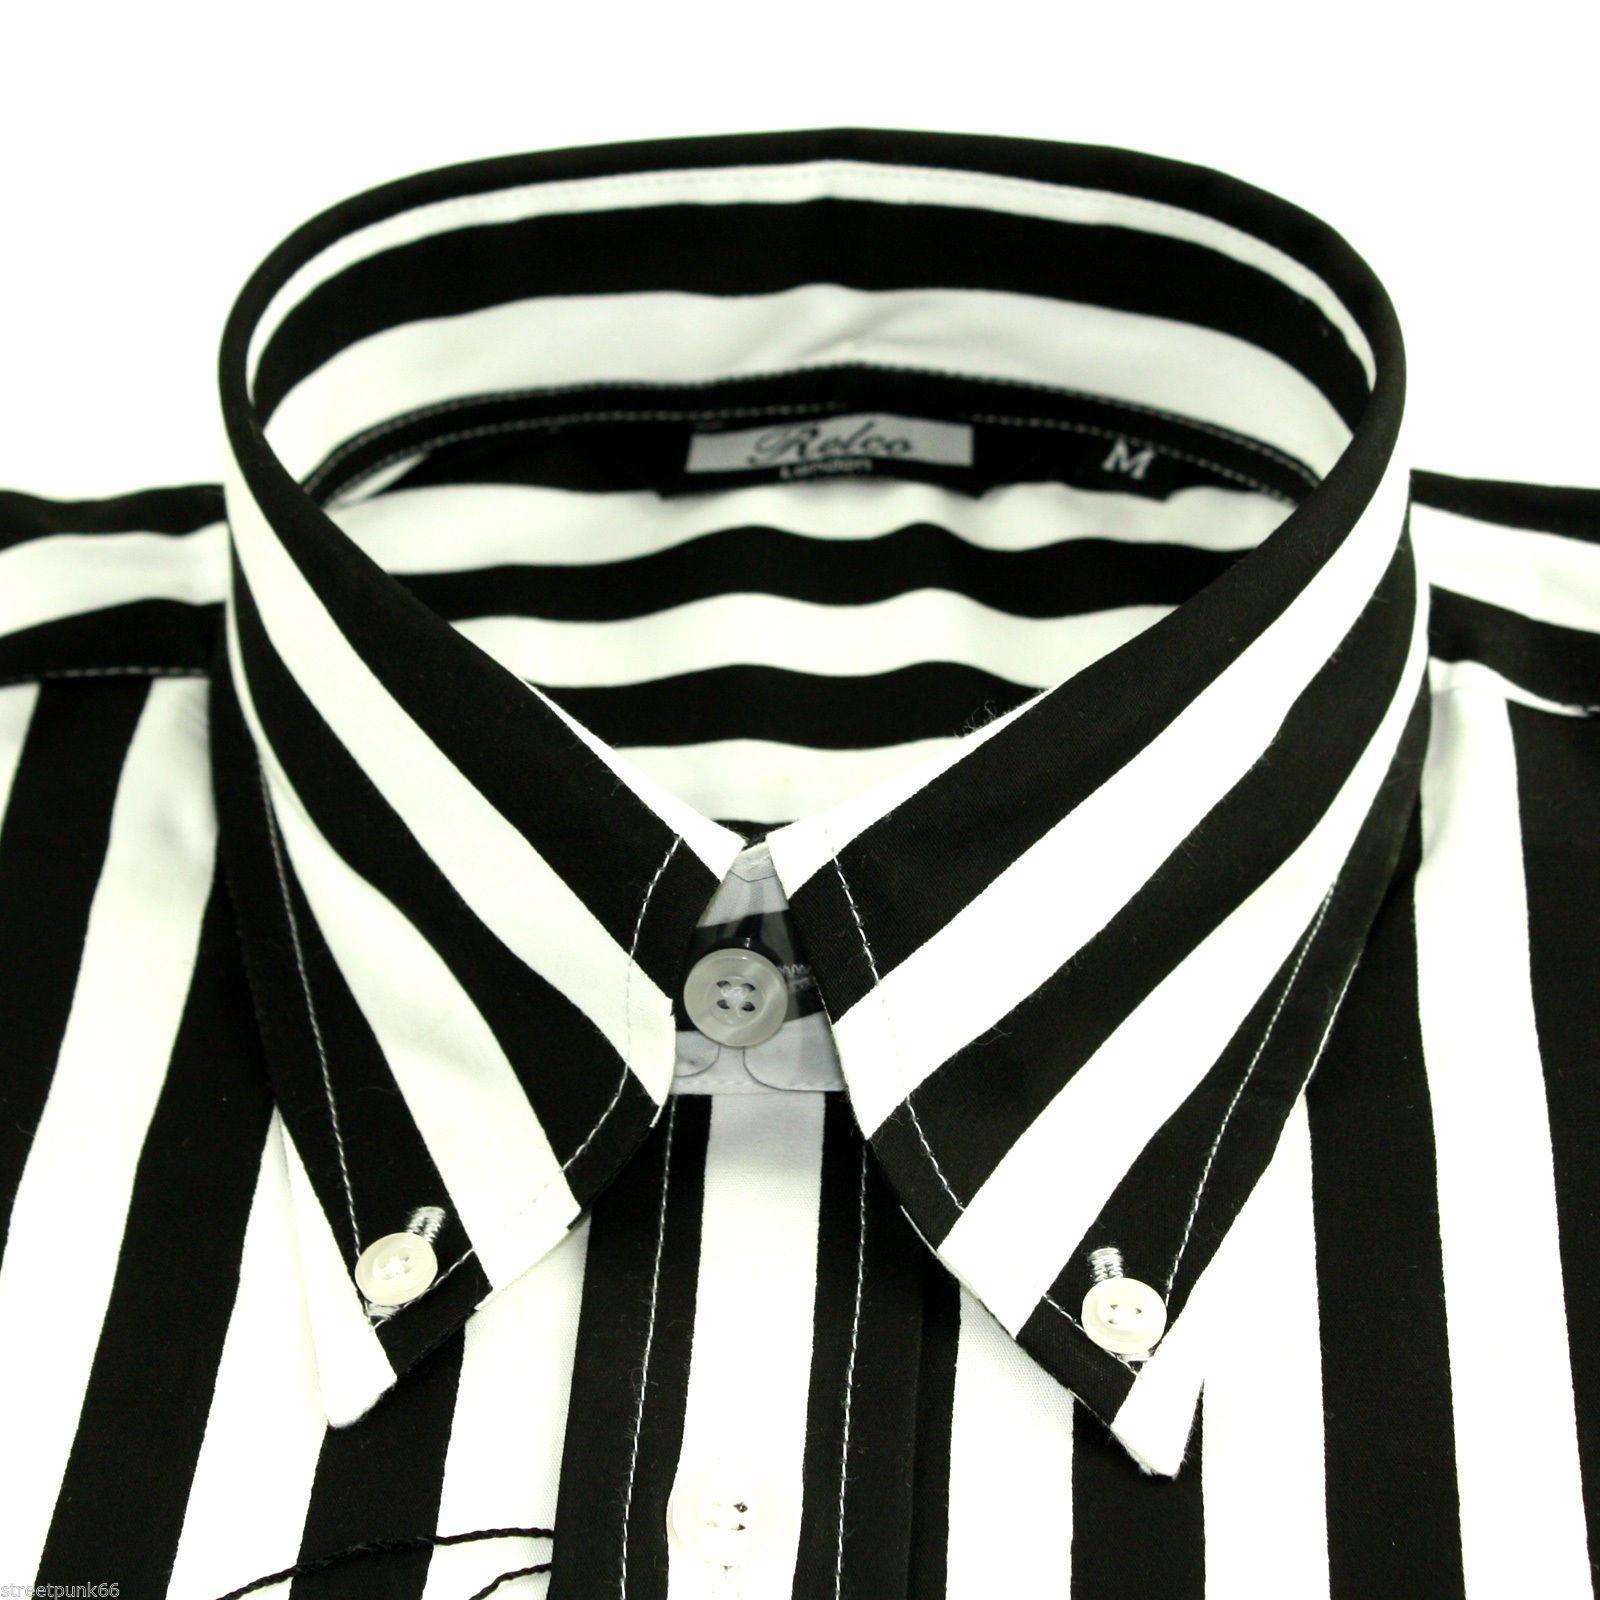 45a59de99b8a Relco Mens Black White Striped Long Sleeved Shirt Mod Skin Retro Indie 60s